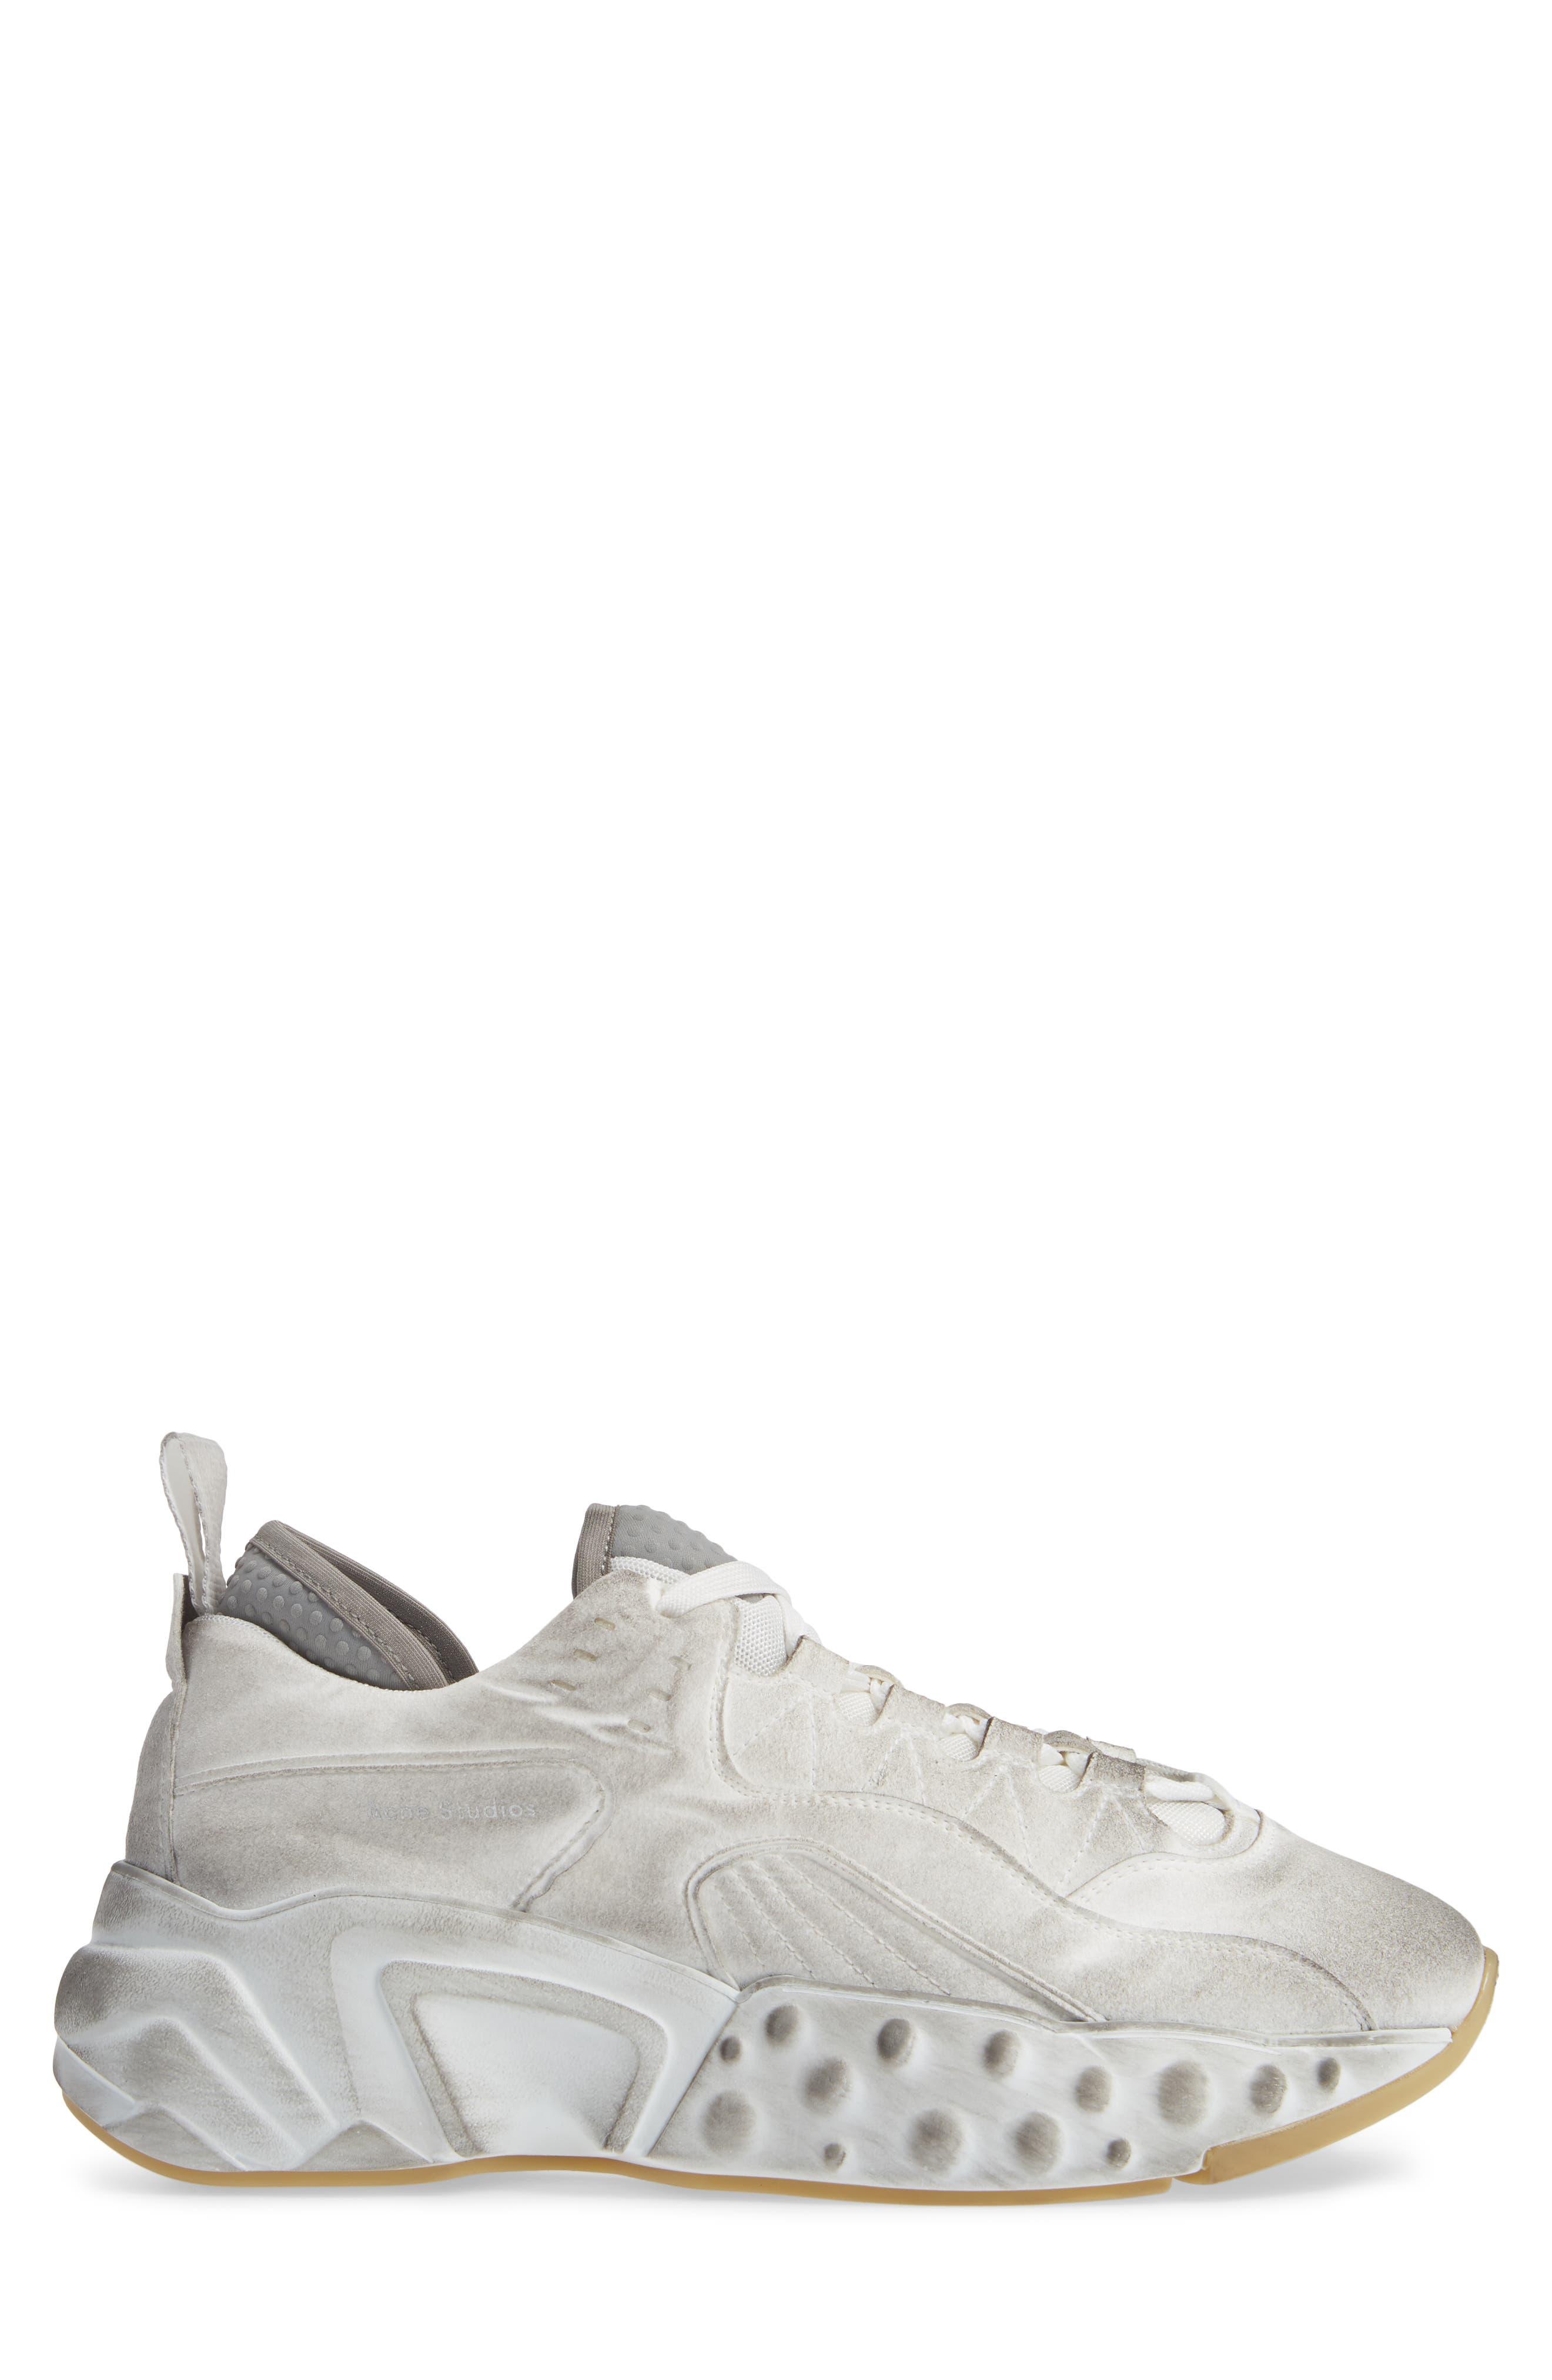 Rockaway Built-Up Sneaker,                             Alternate thumbnail 3, color,                             WHITE